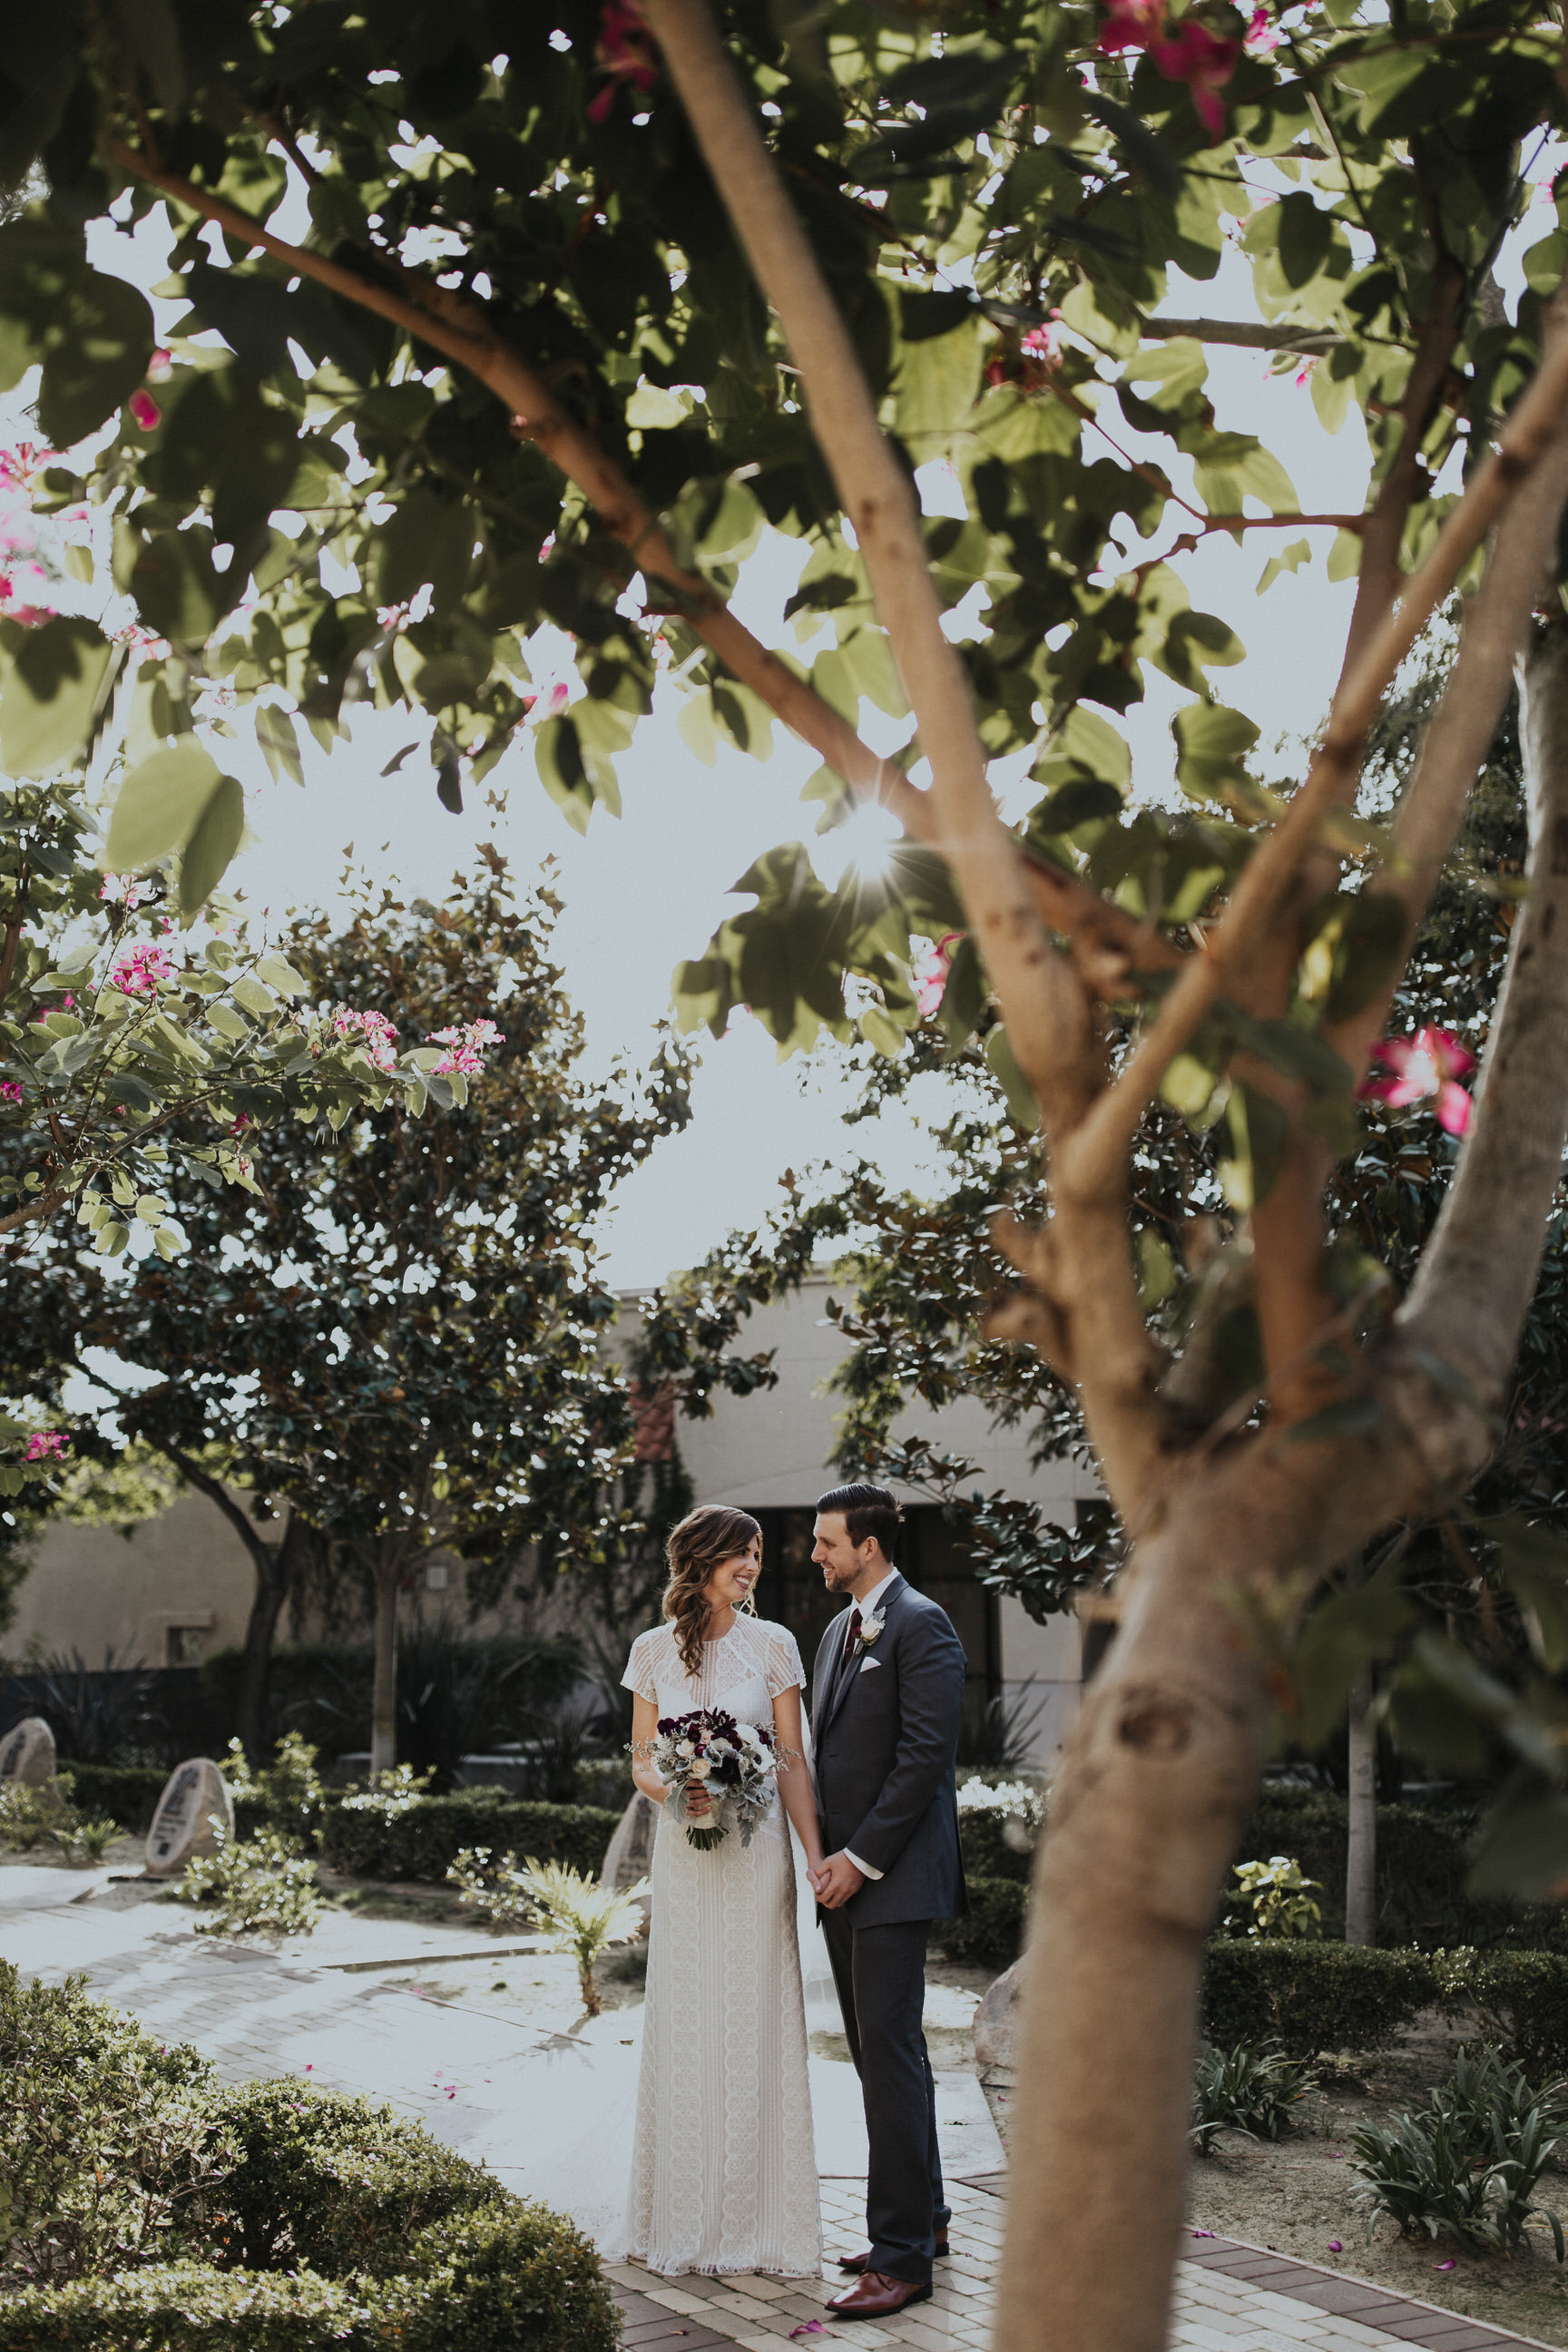 Michelle + Nathan-49.jpg